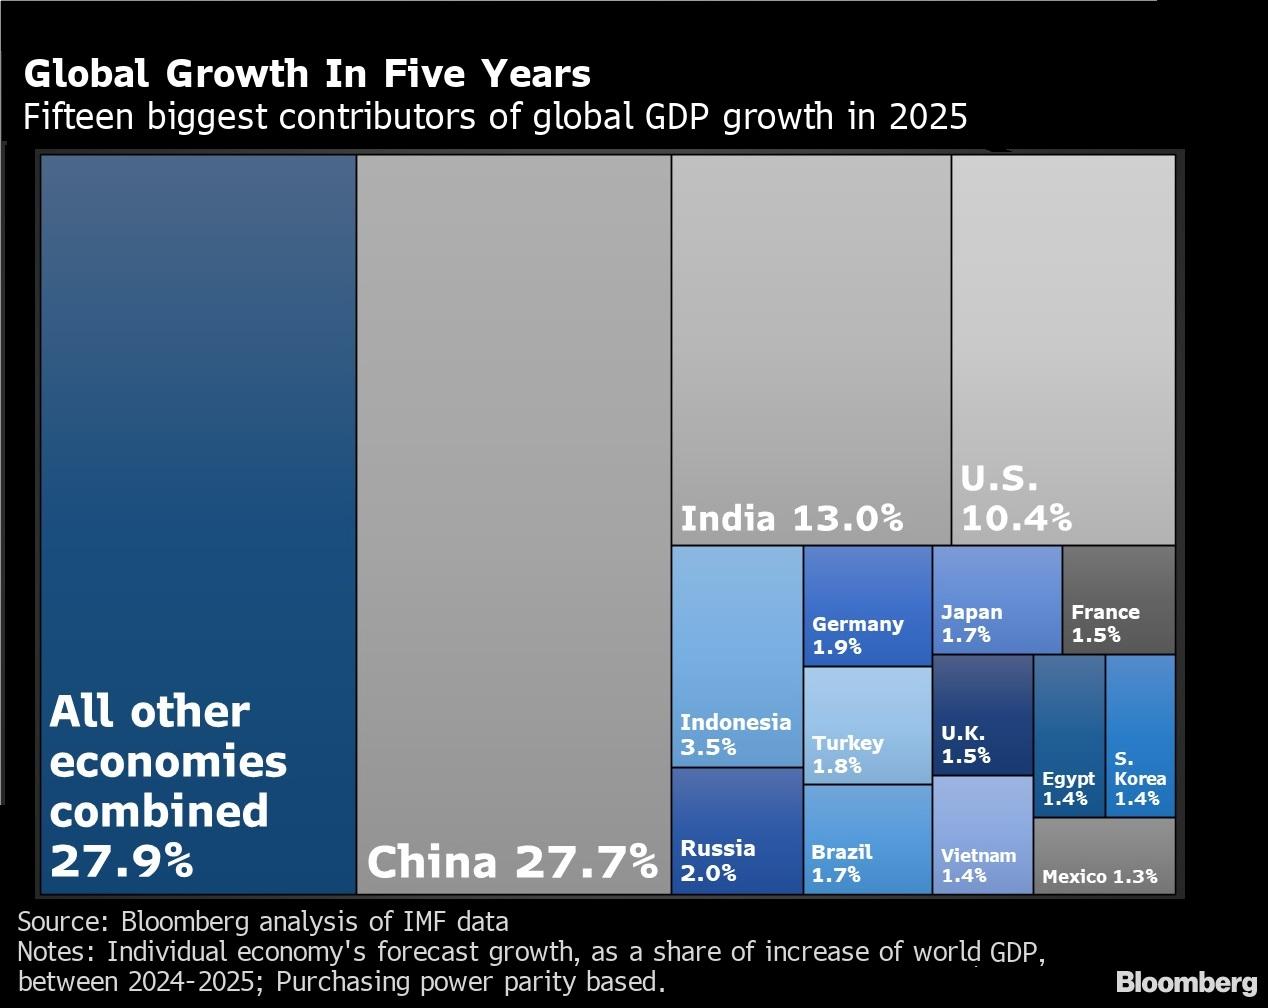 relates to IMF Data Shows Virus Will Push China GDP Growth Well Beyond U.S.